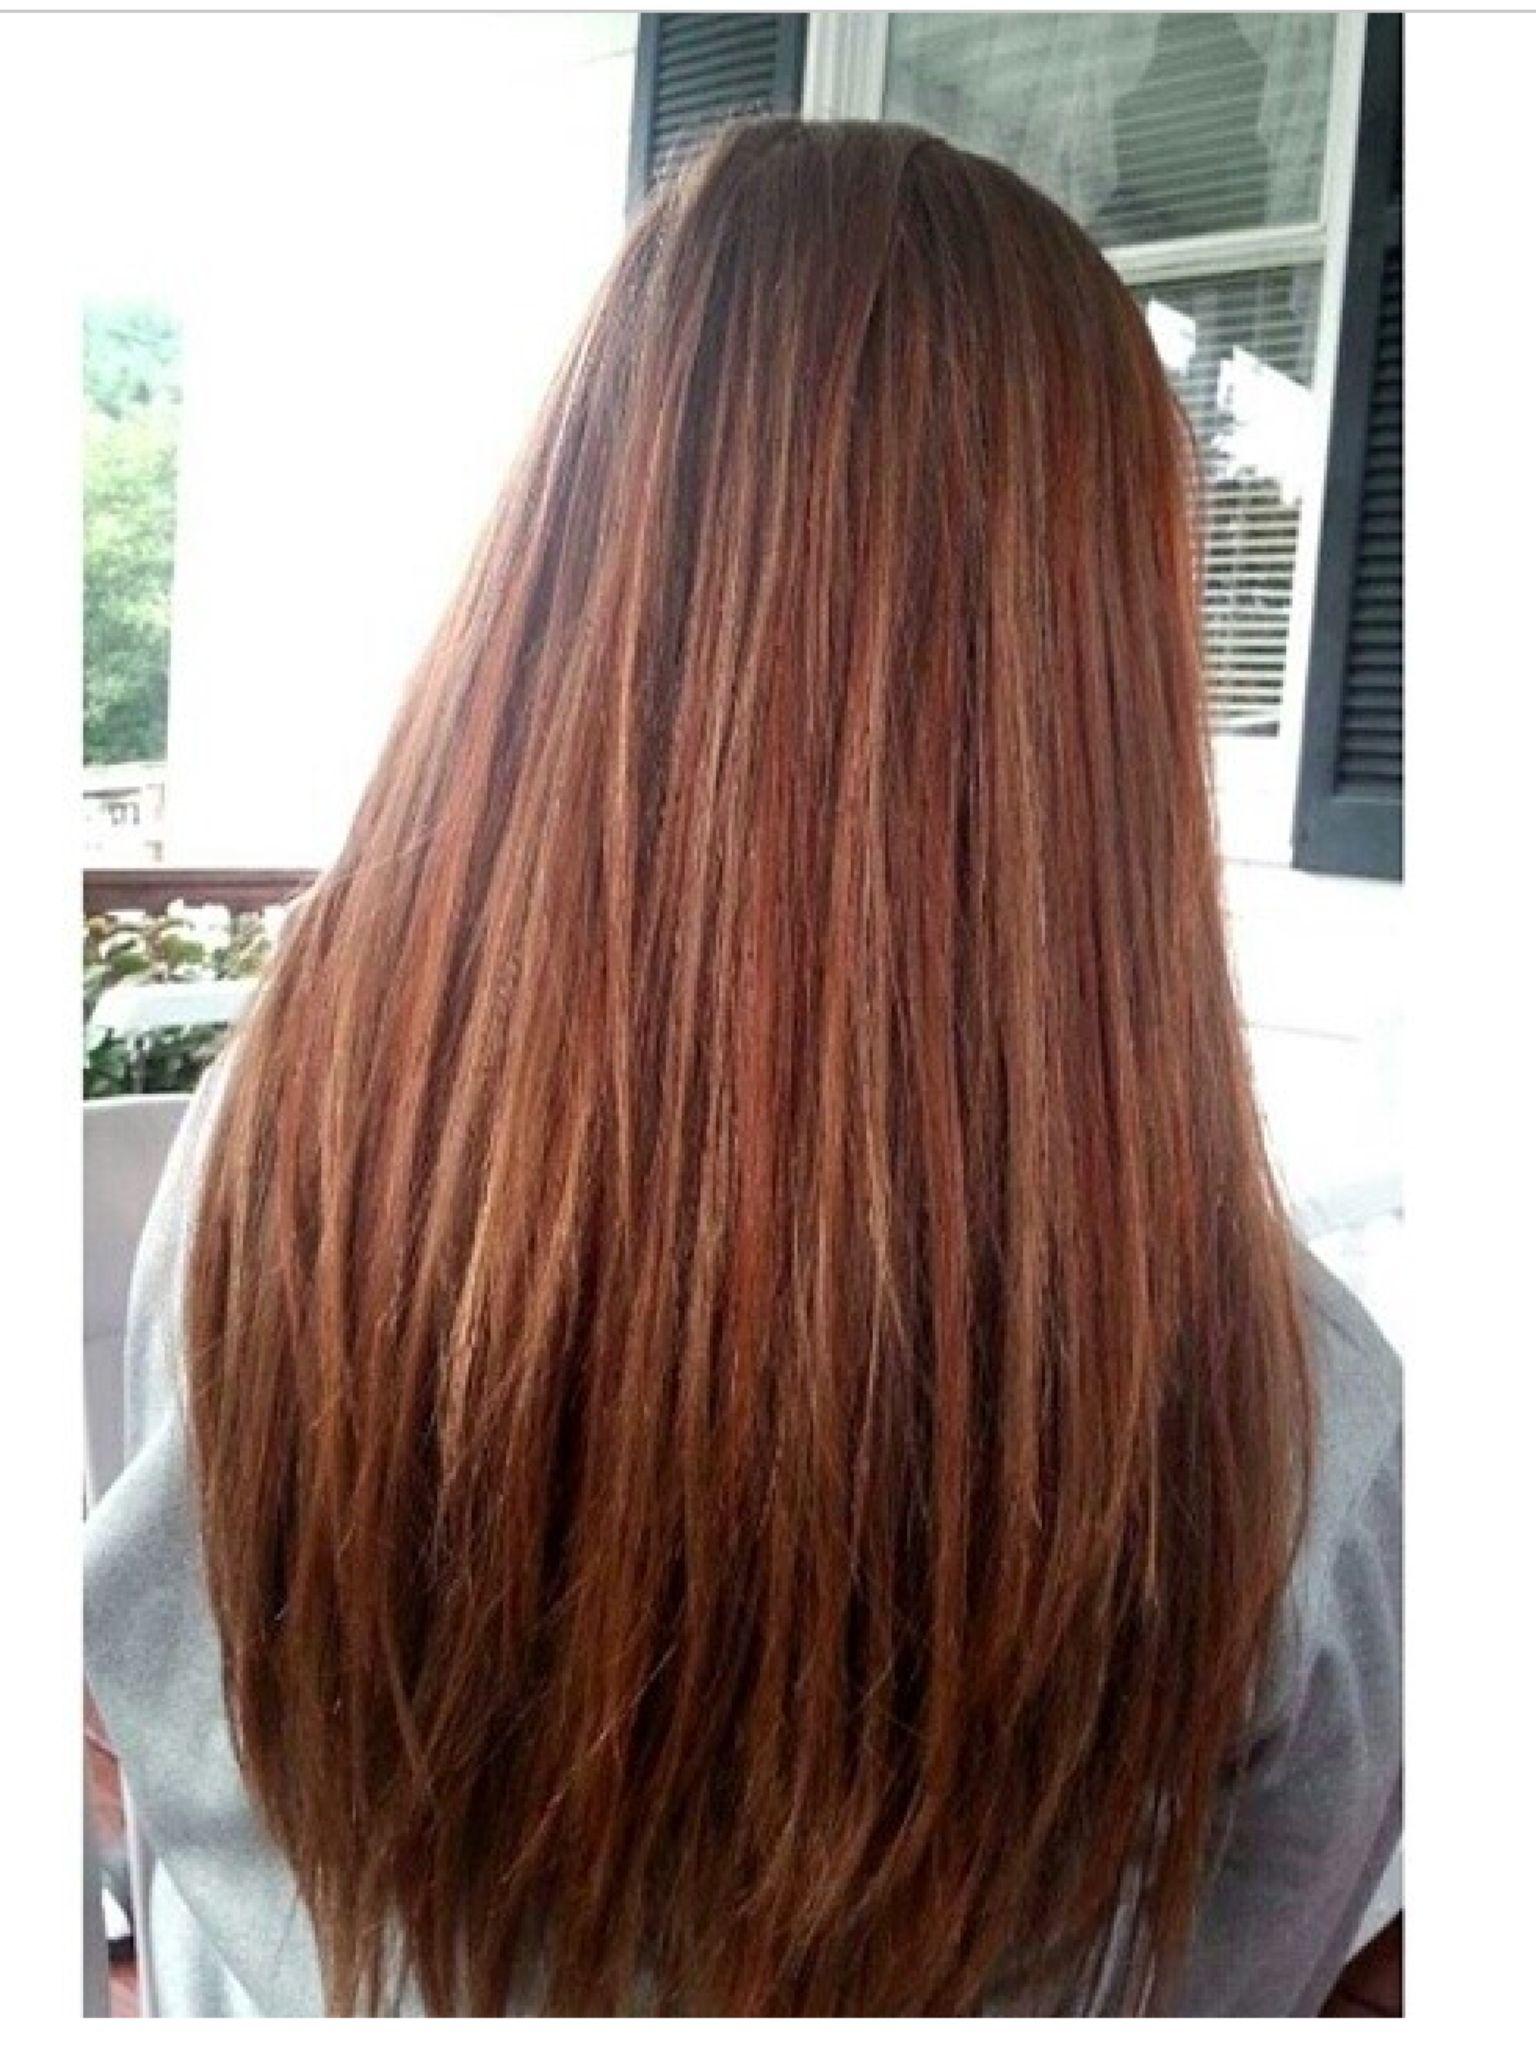 Auburn And Carmel Highlights On Natural Brunette Hair